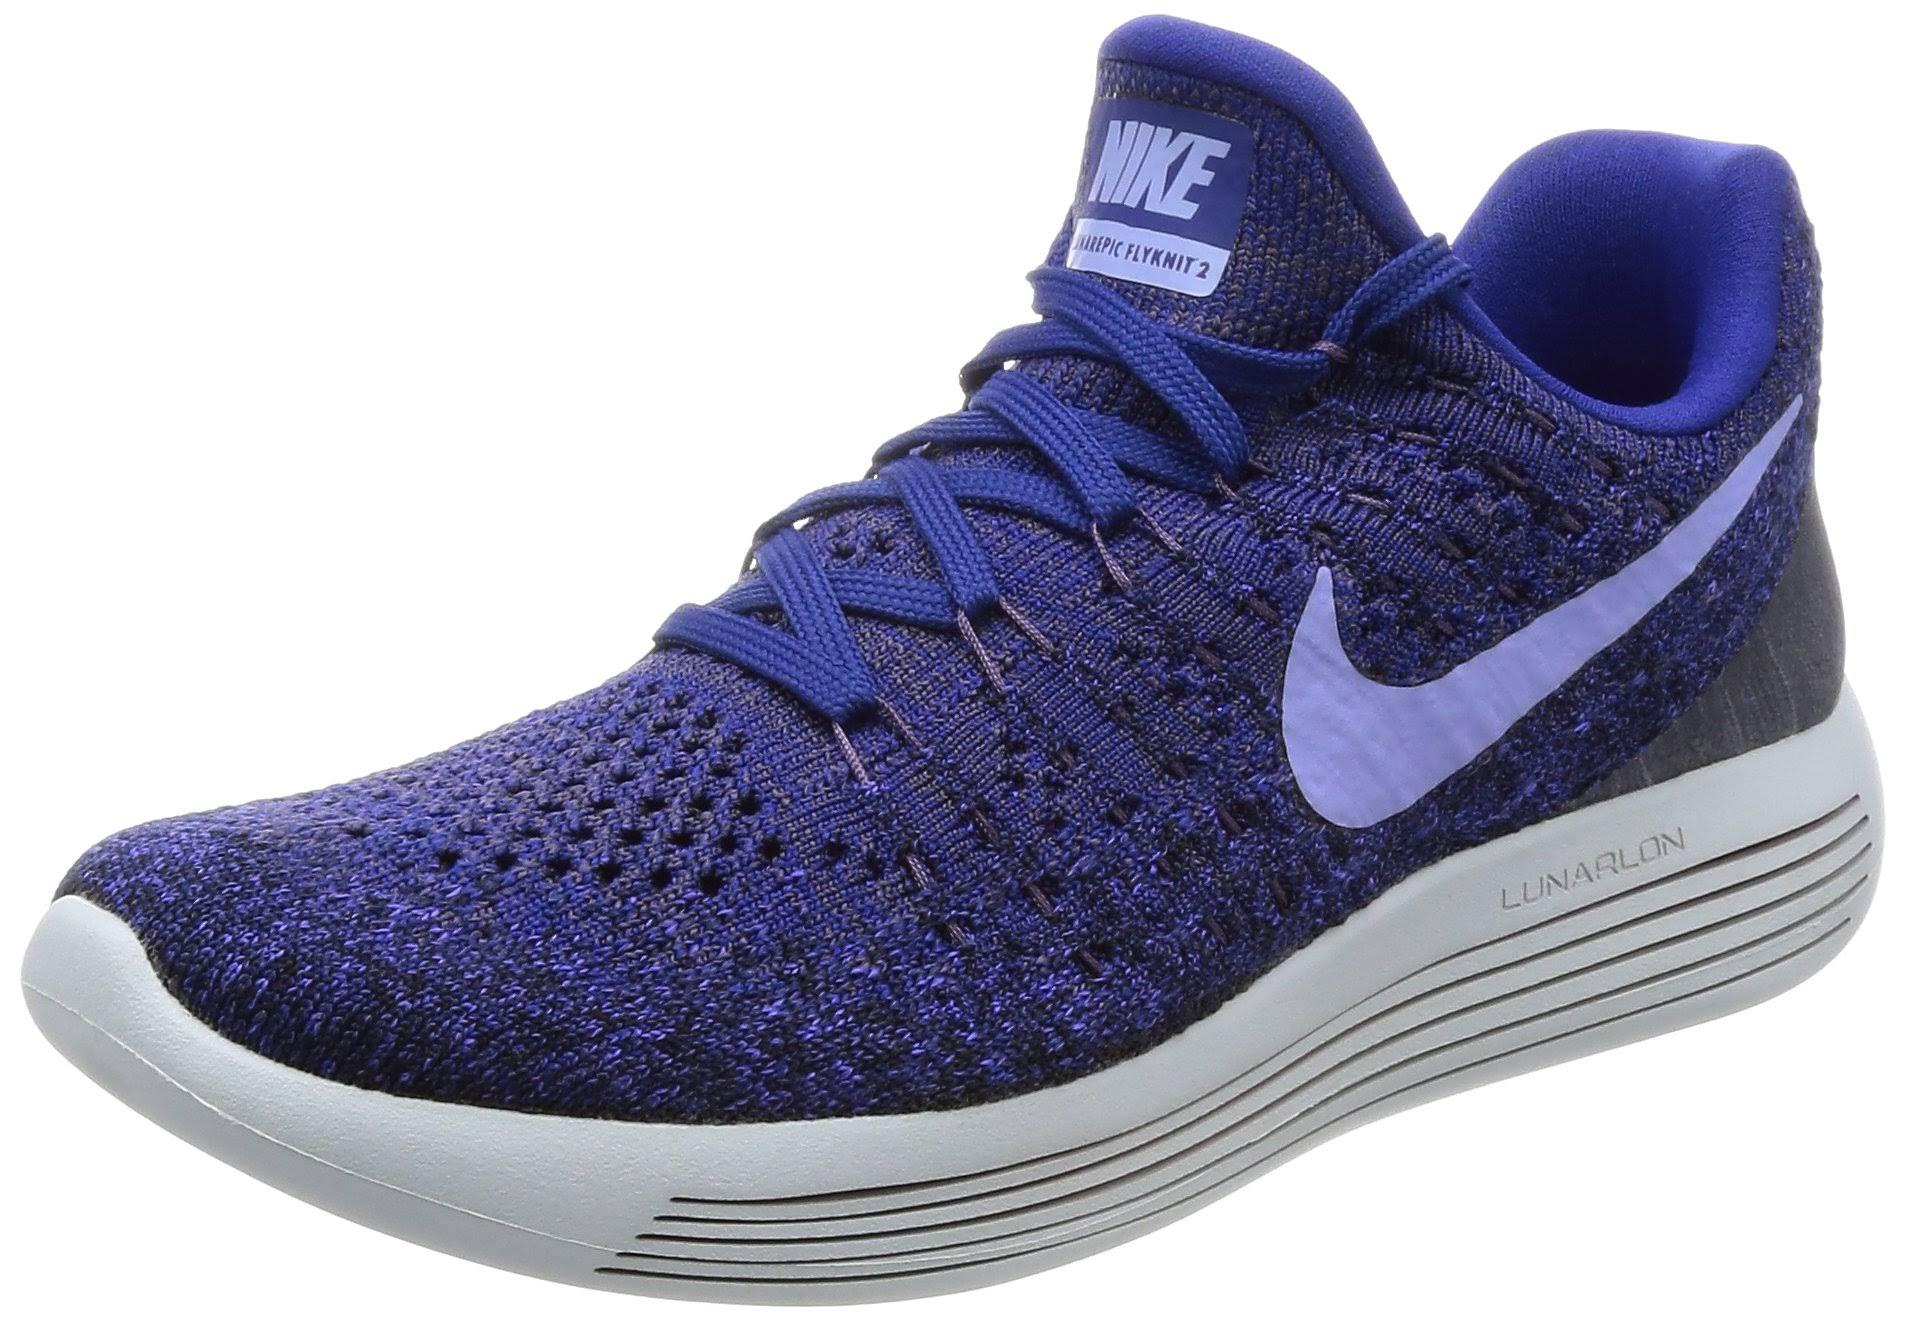 Royal Raisin Wmns Nike Lunarepic Ii Purple Flyknit Low Wome 2 Black Blue Dark Deep ZwUfqP